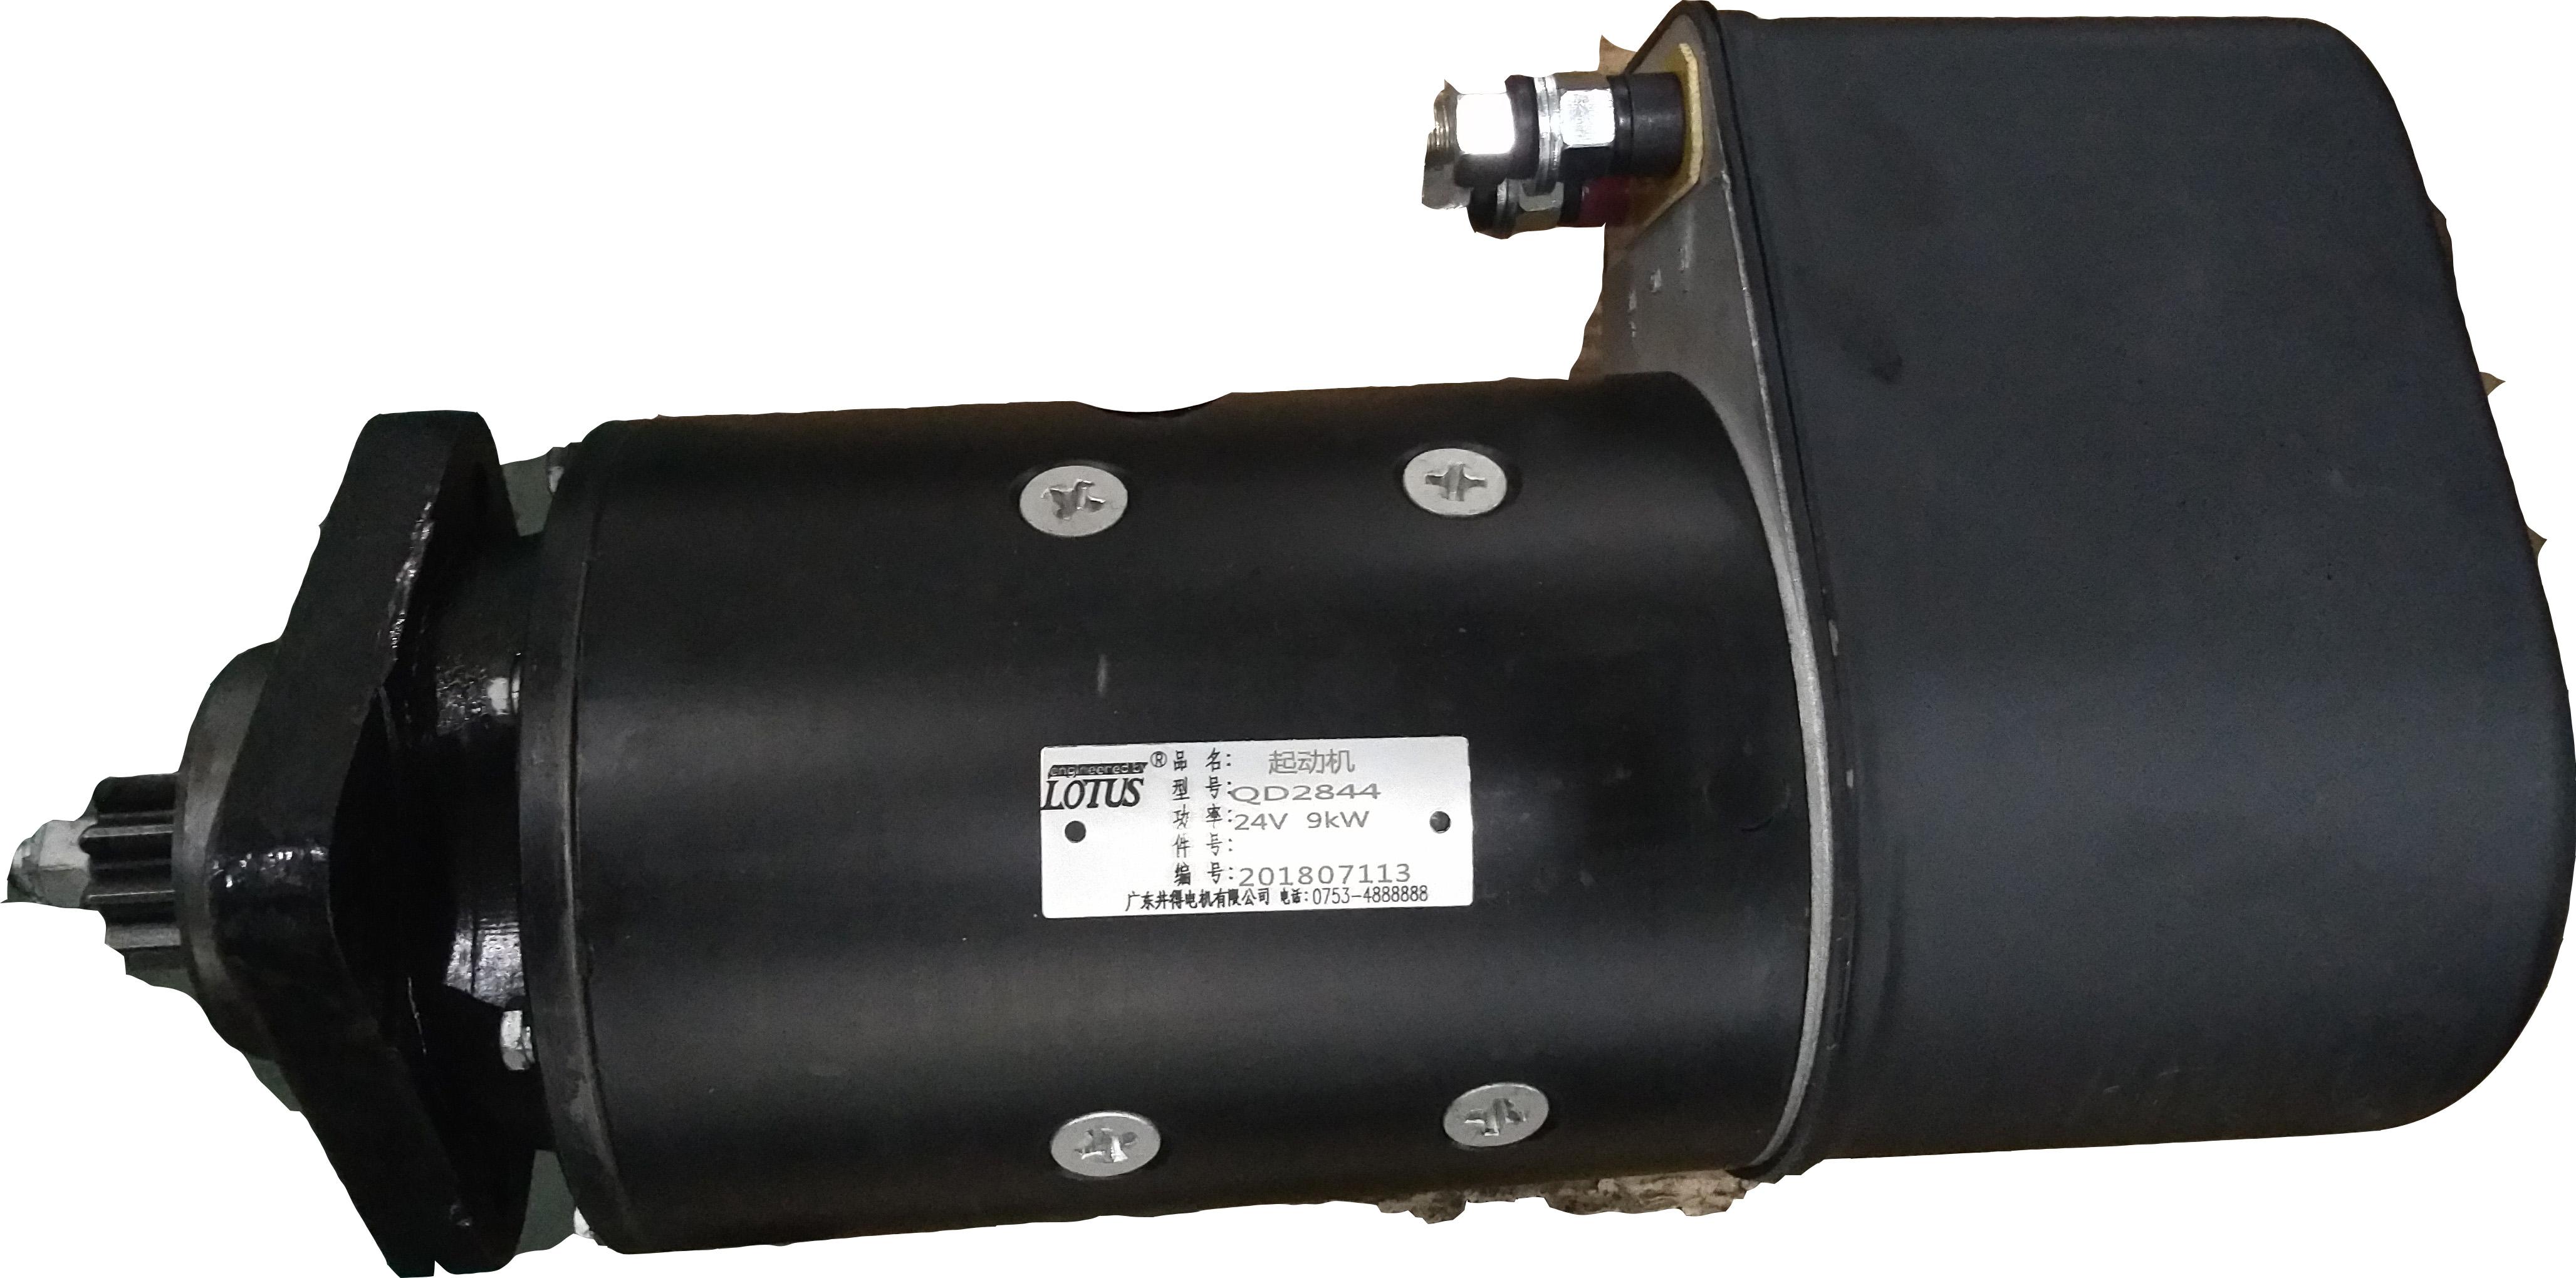 QD2844